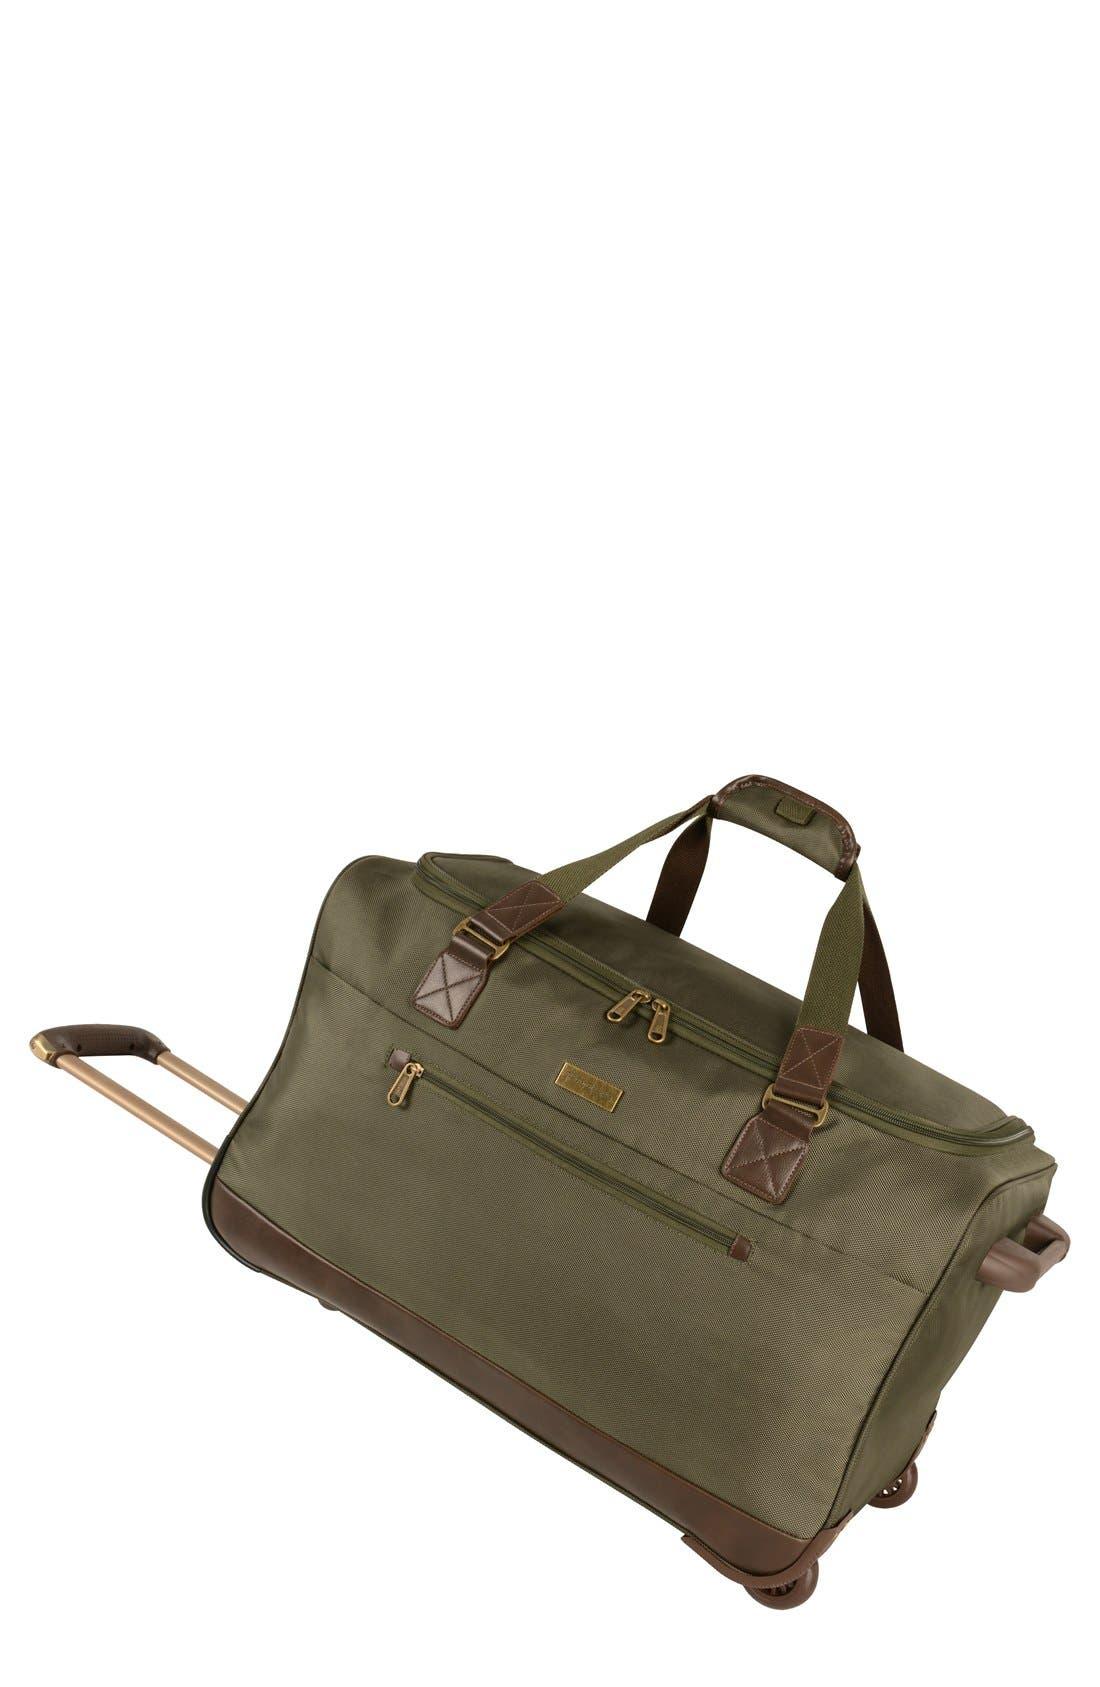 TOMMY BAHAMA Surge Wheeled Duffel Bag